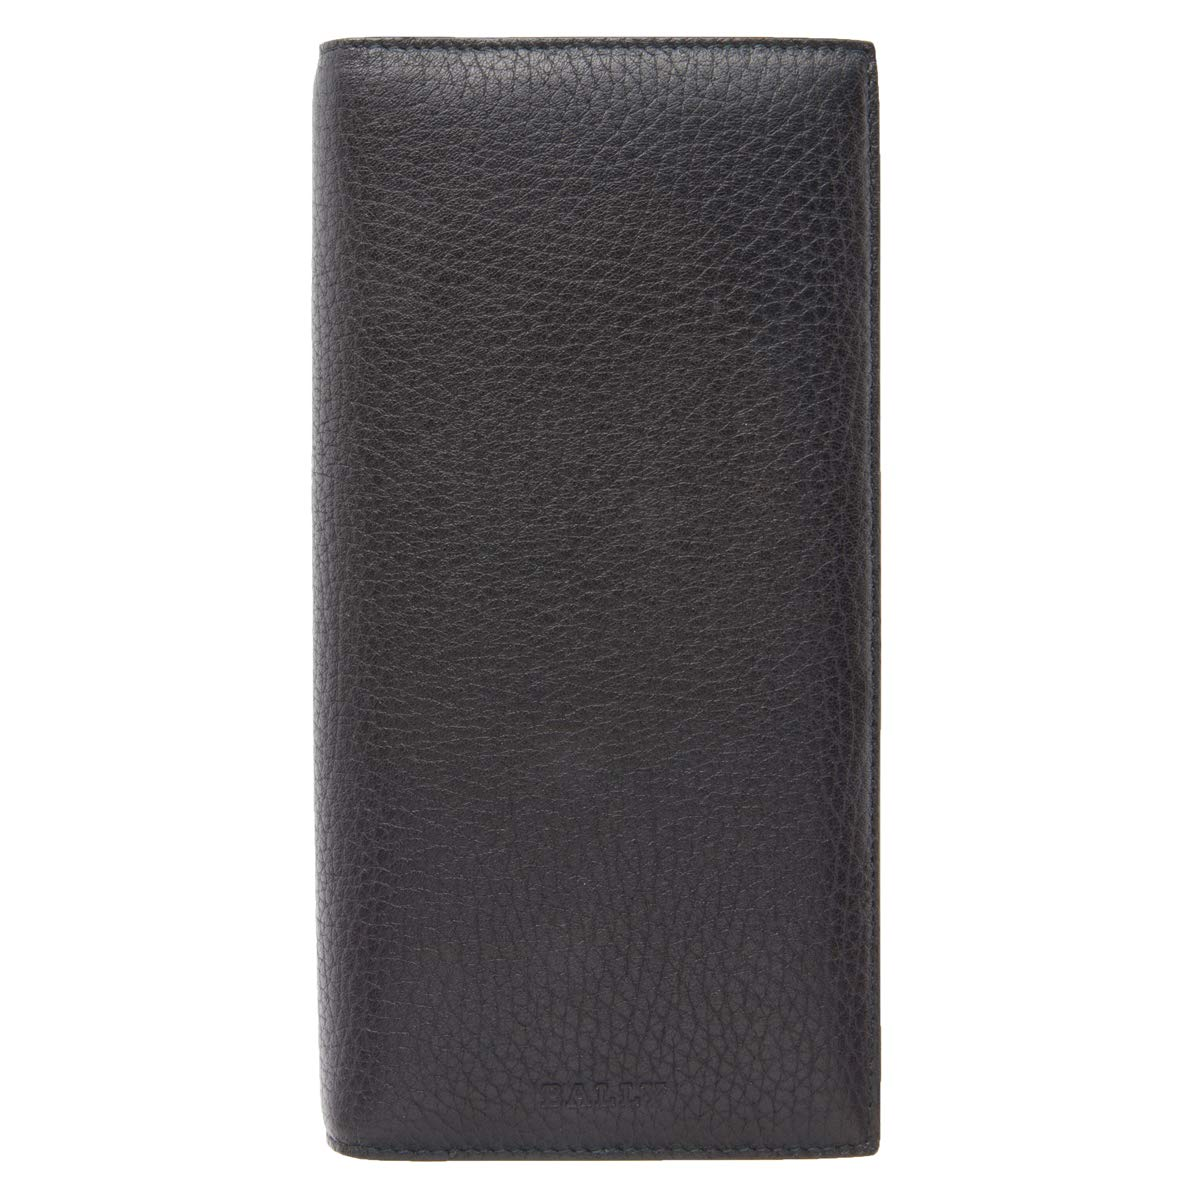 [BALLY(バリー)] 二つ折り 長財布 STRADDOK カーフレザー 黒 ブラック 6208053001 メンズ (M207004) [並行輸入品] B07JKTFW75